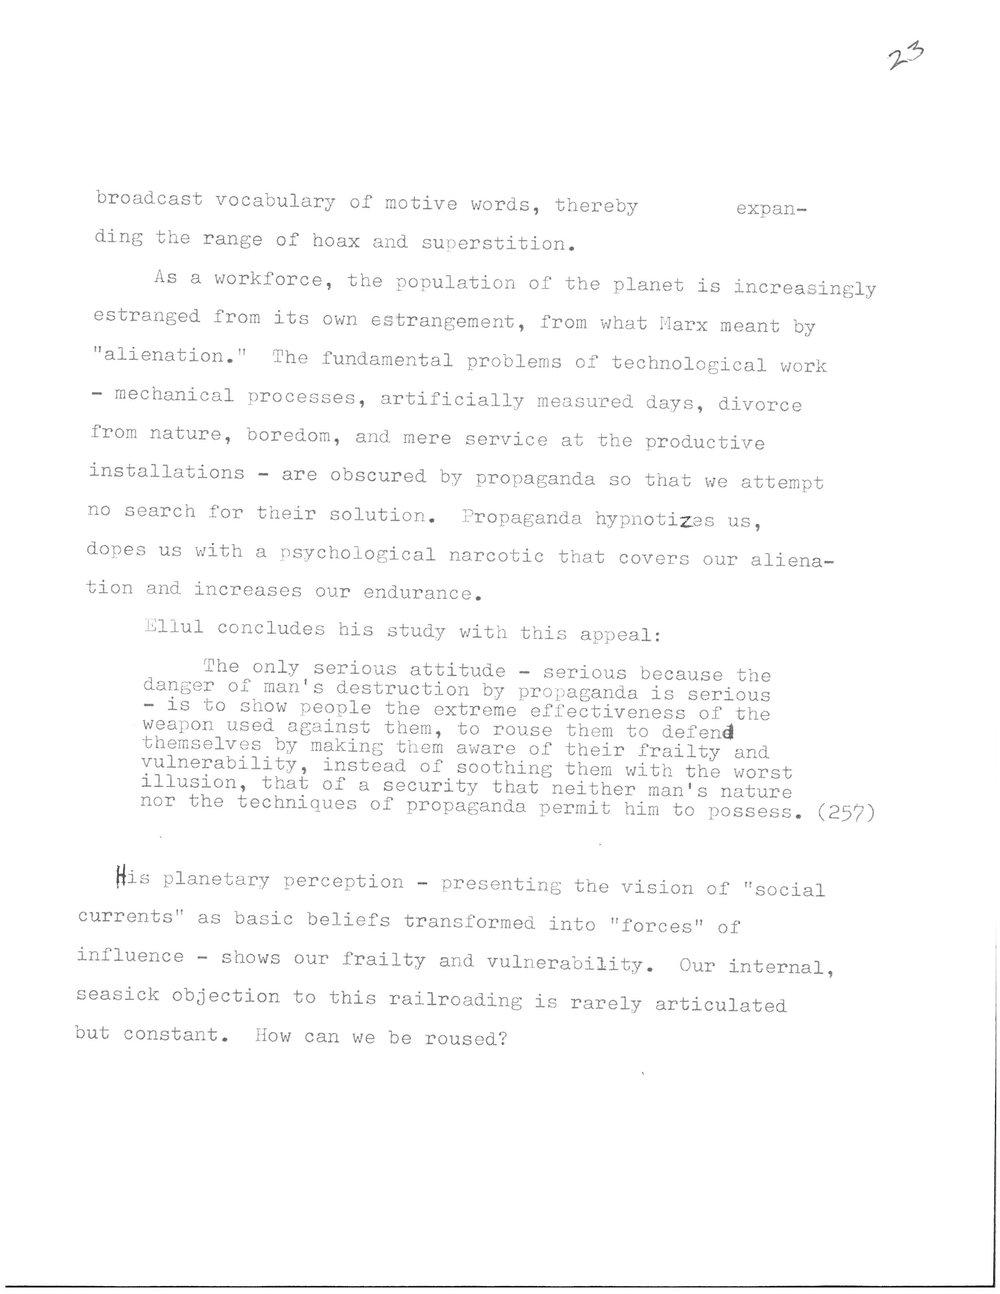 Propaganda_Page_25.jpg